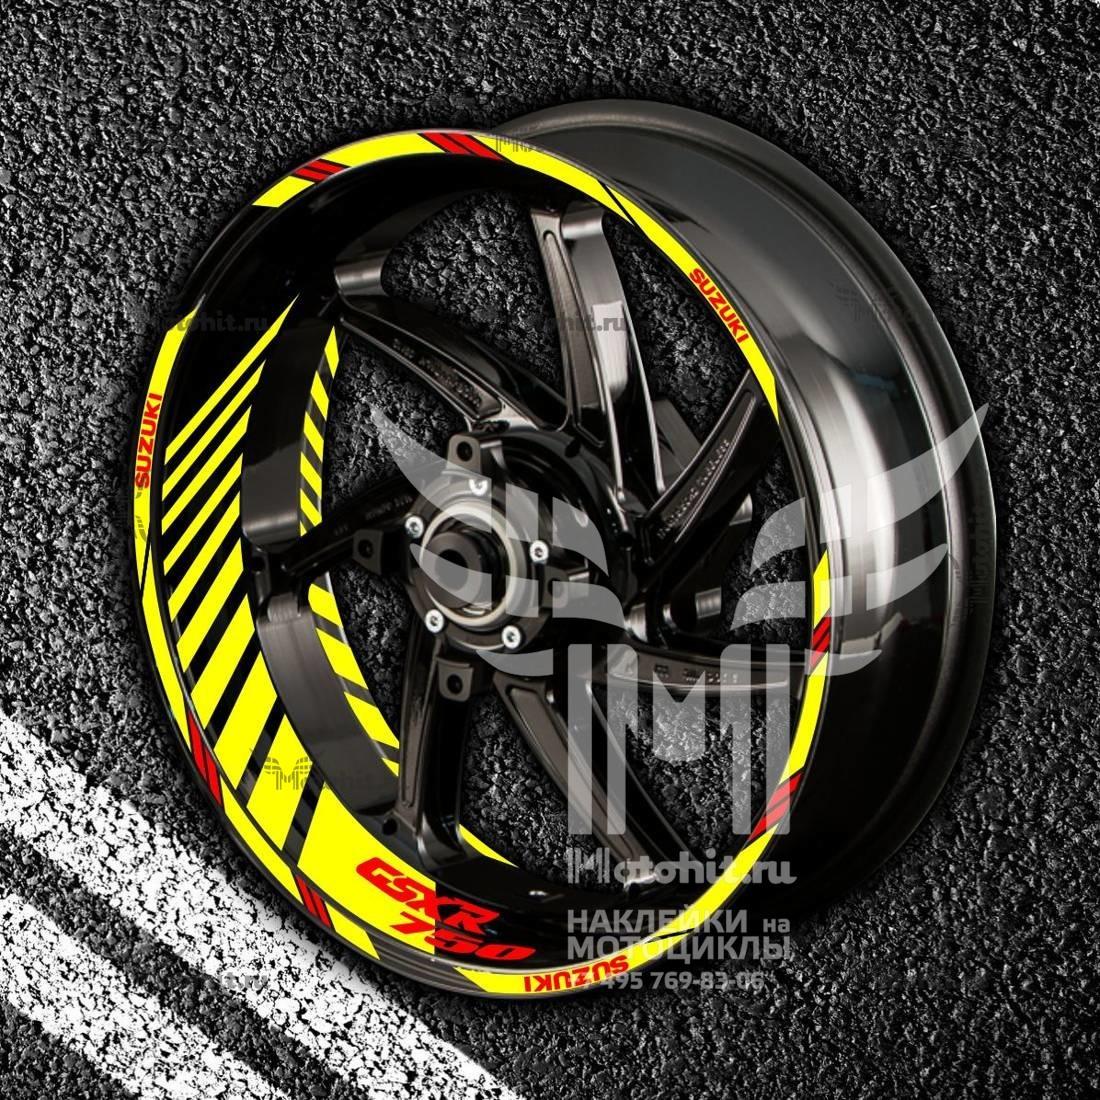 Комплект наклеек с полосами на колеса мотоцикла SUZUKI GSX-R-750